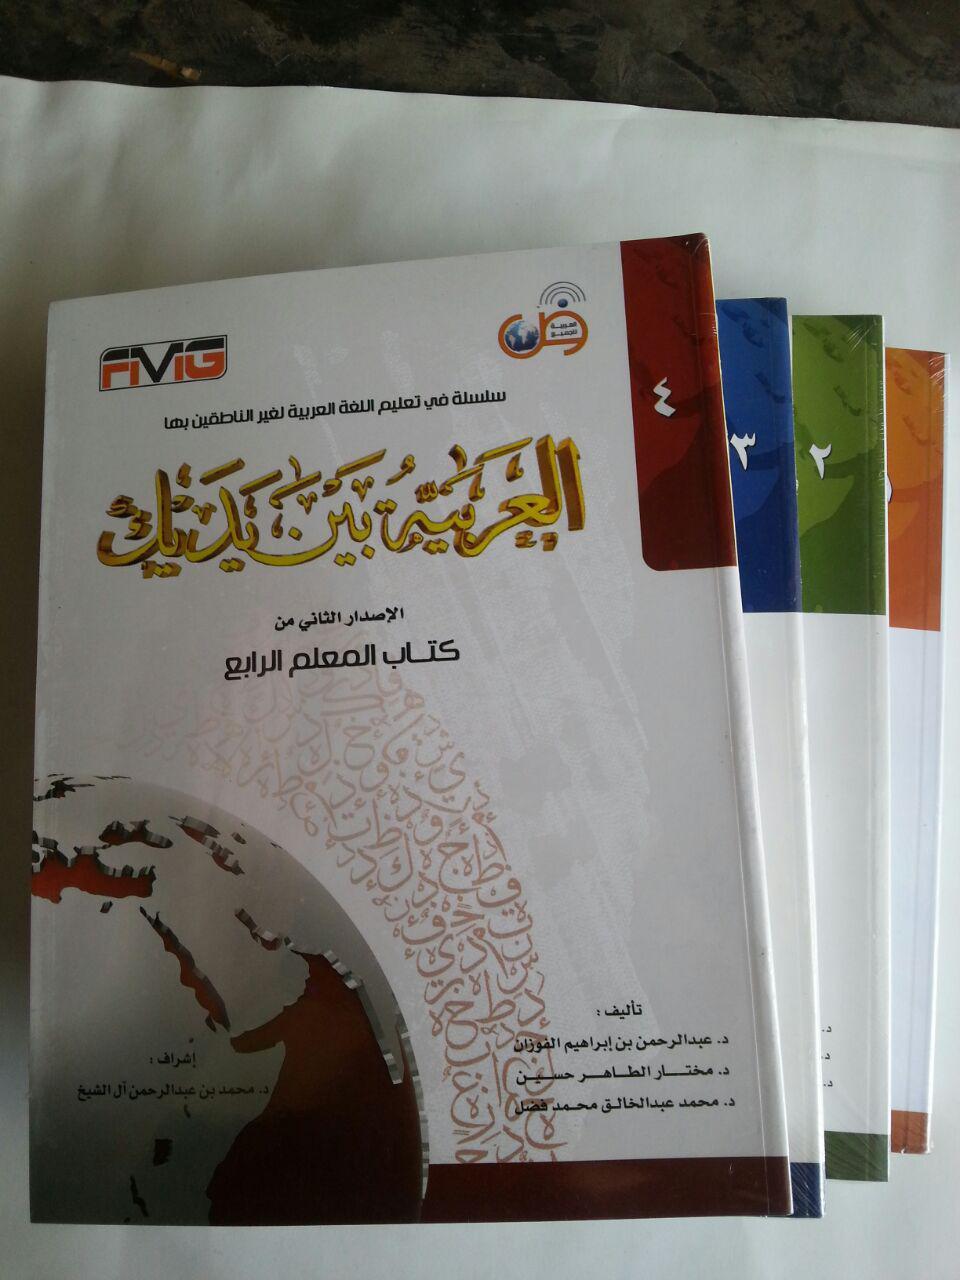 Kitab Al-Arabiyyah Baina Yadaik Kitabul Muallim cover 3